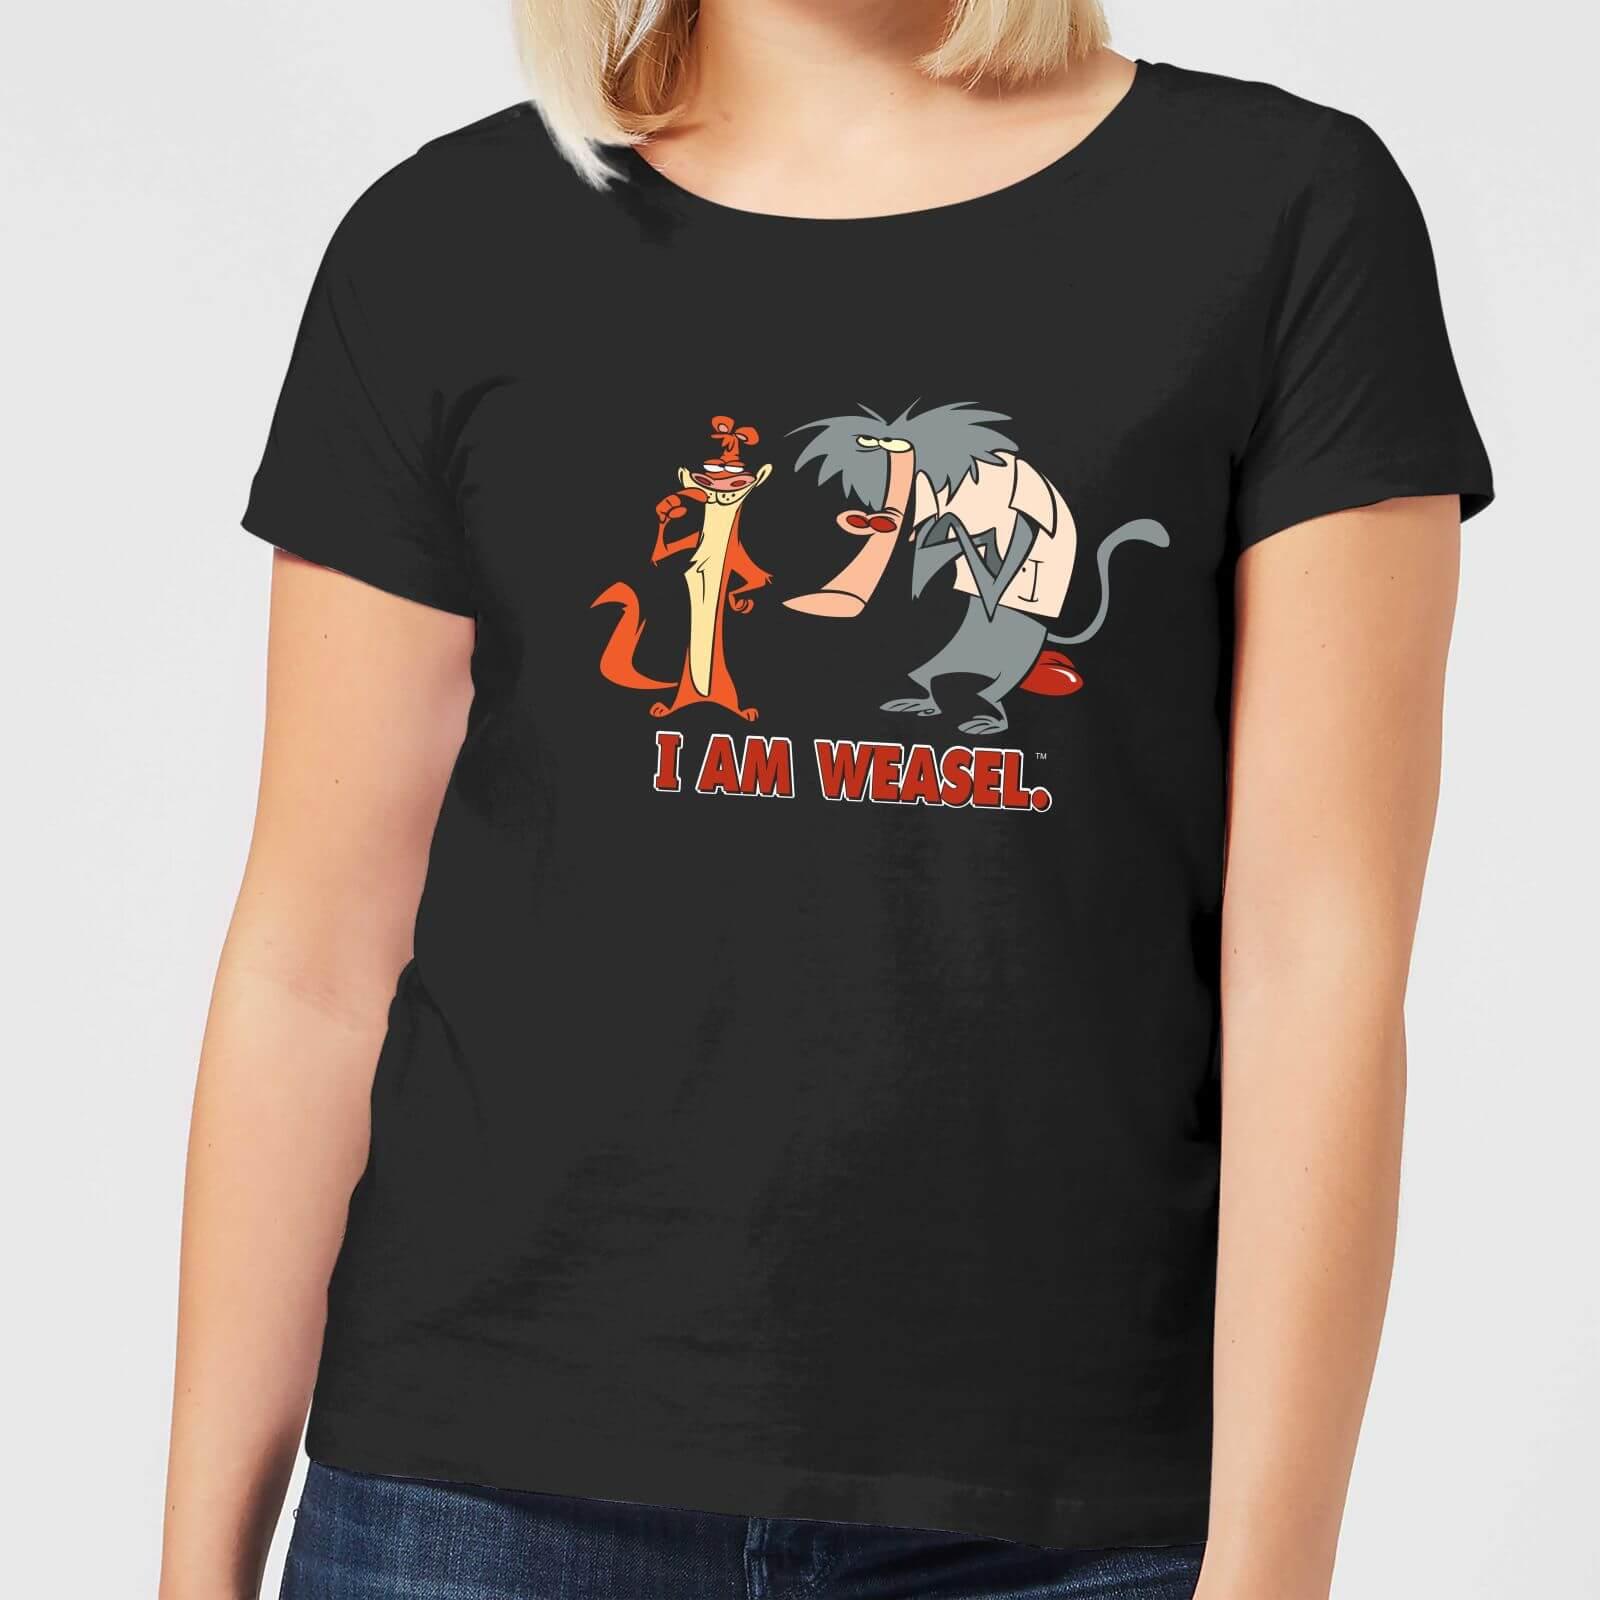 Cartoon Network I Am Weasel Characters Women's T-Shirt - Black - XL - Black